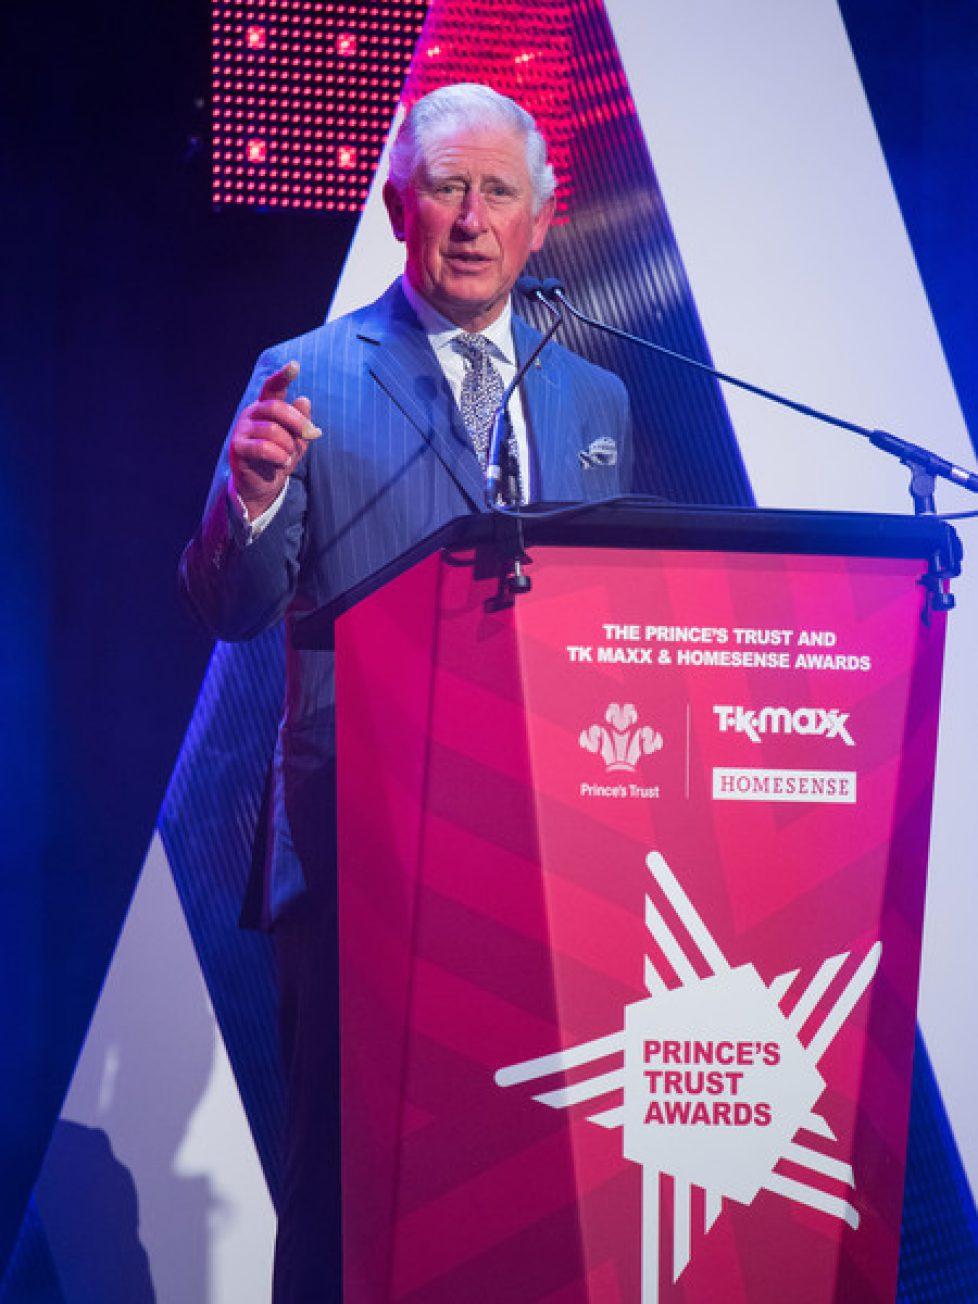 Prince+Wales+Attends+Prince+Trust+Awards+J2Ndy6hESval